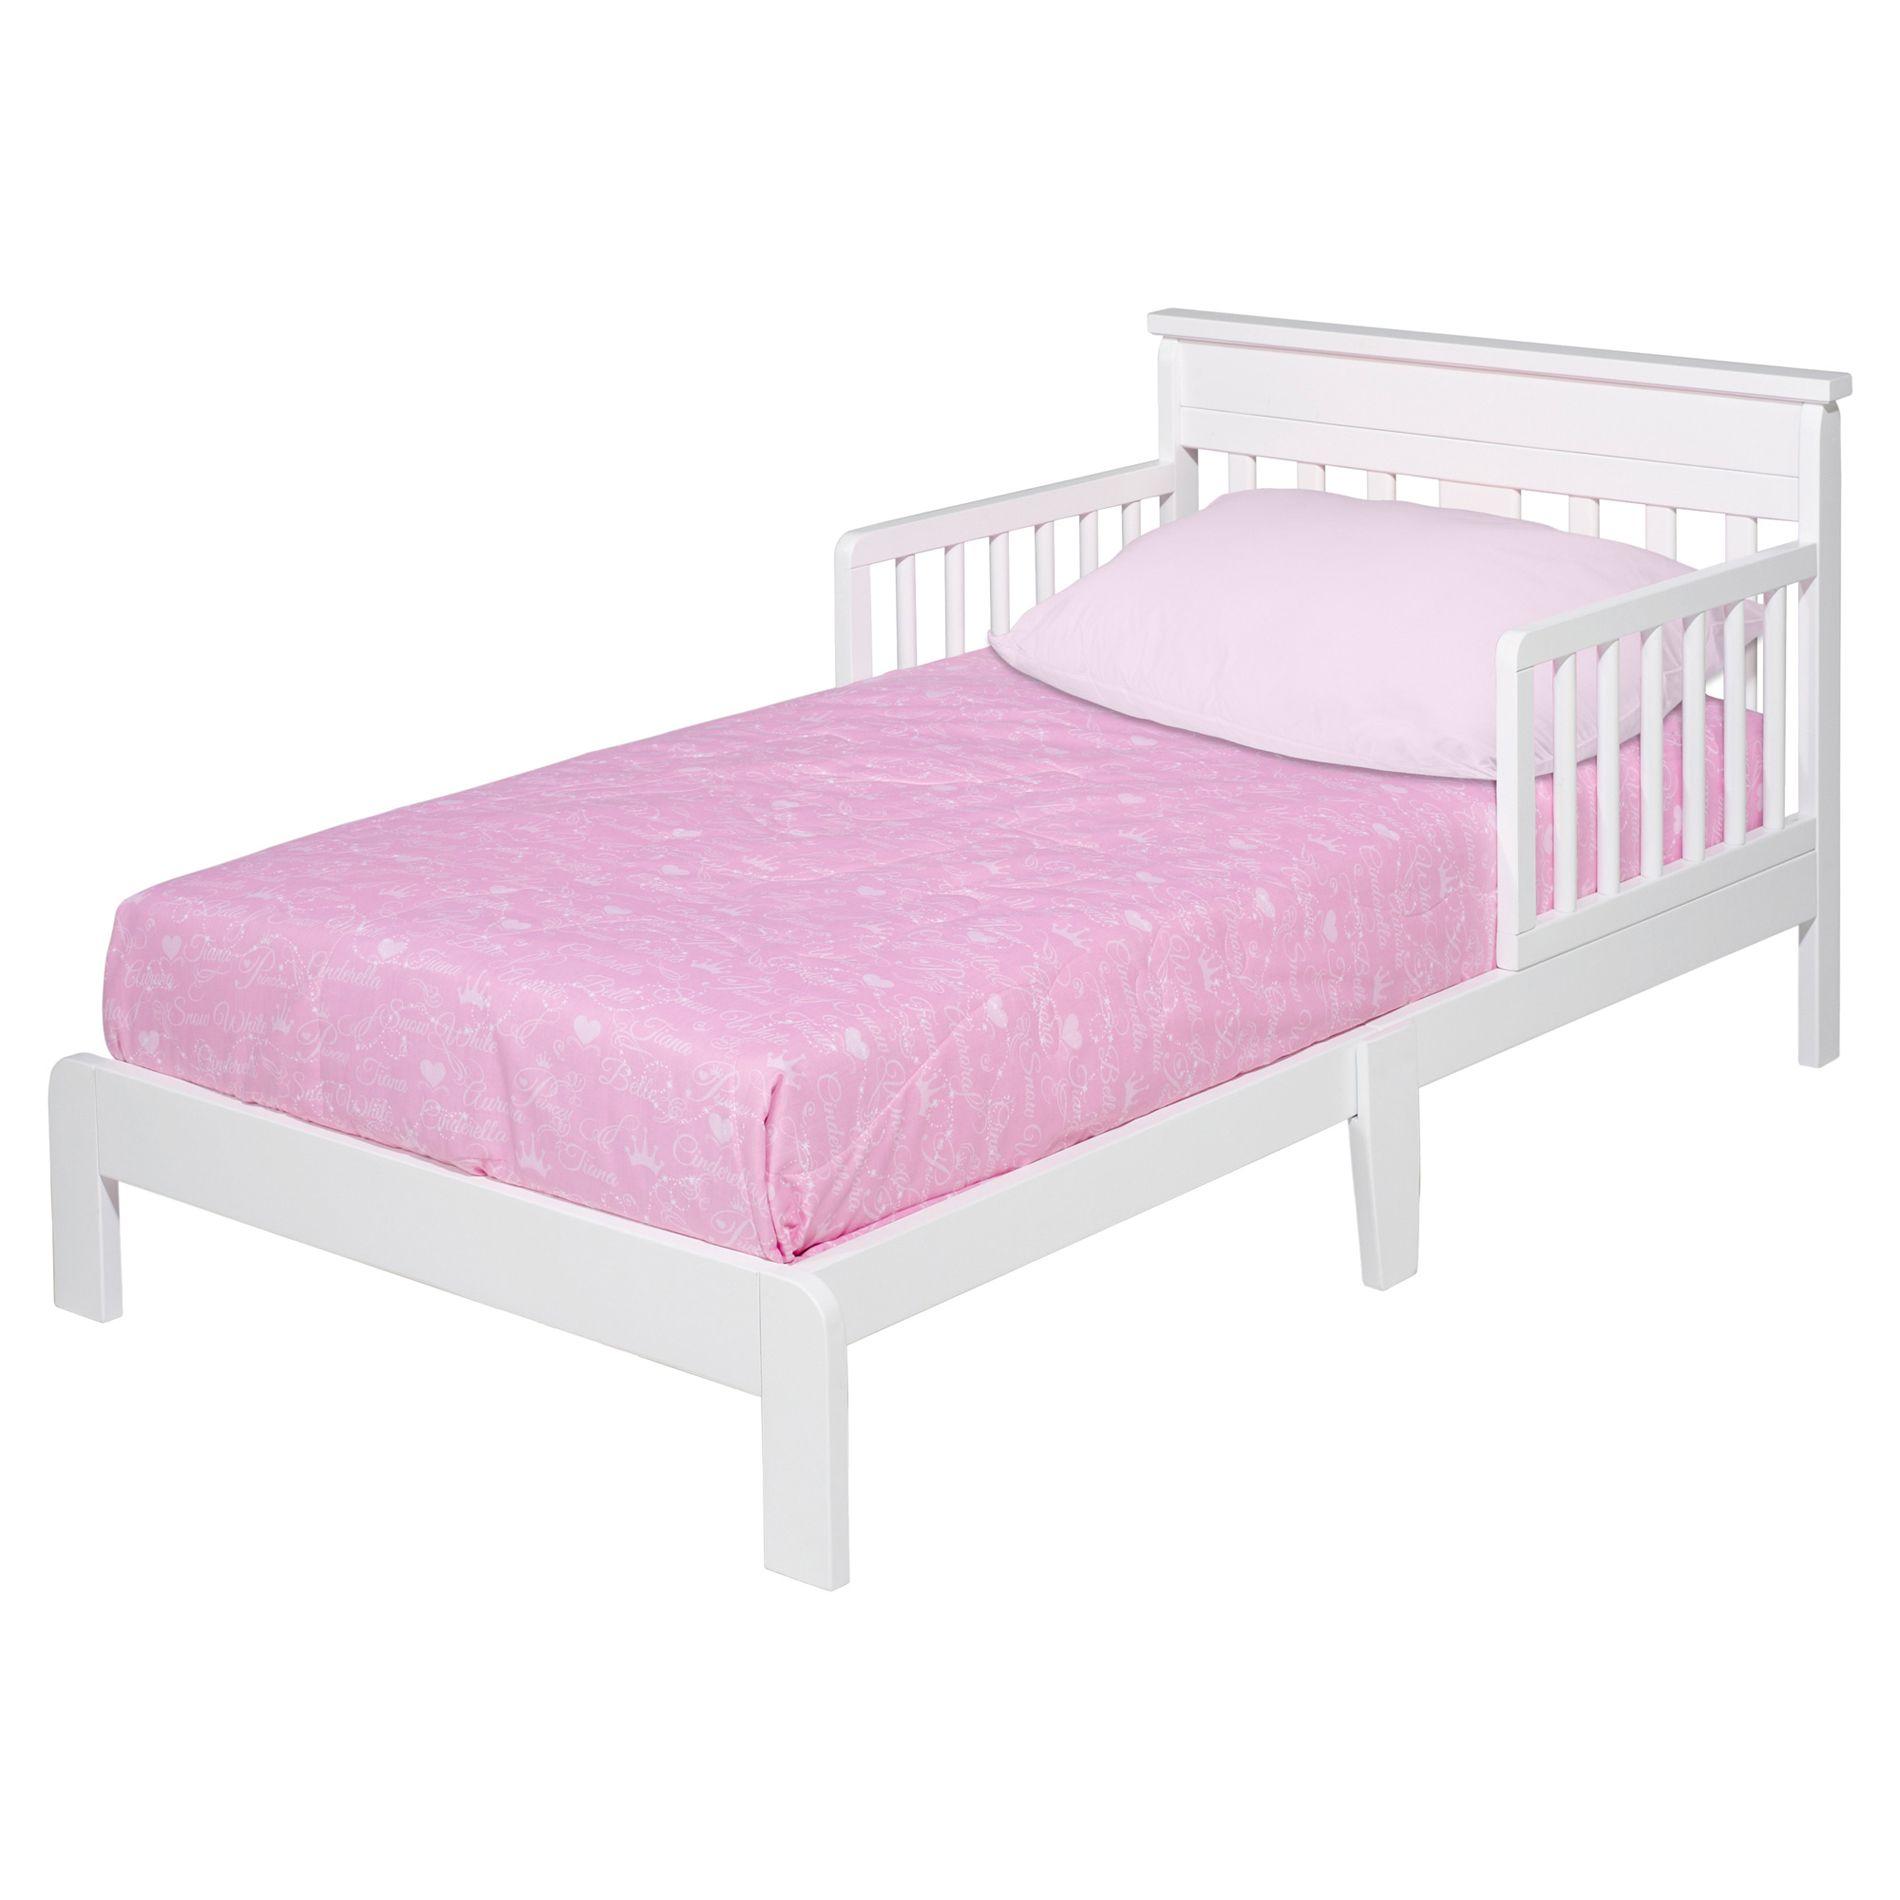 Best Delta Wooden Toddler Bed White wooden toddler bed